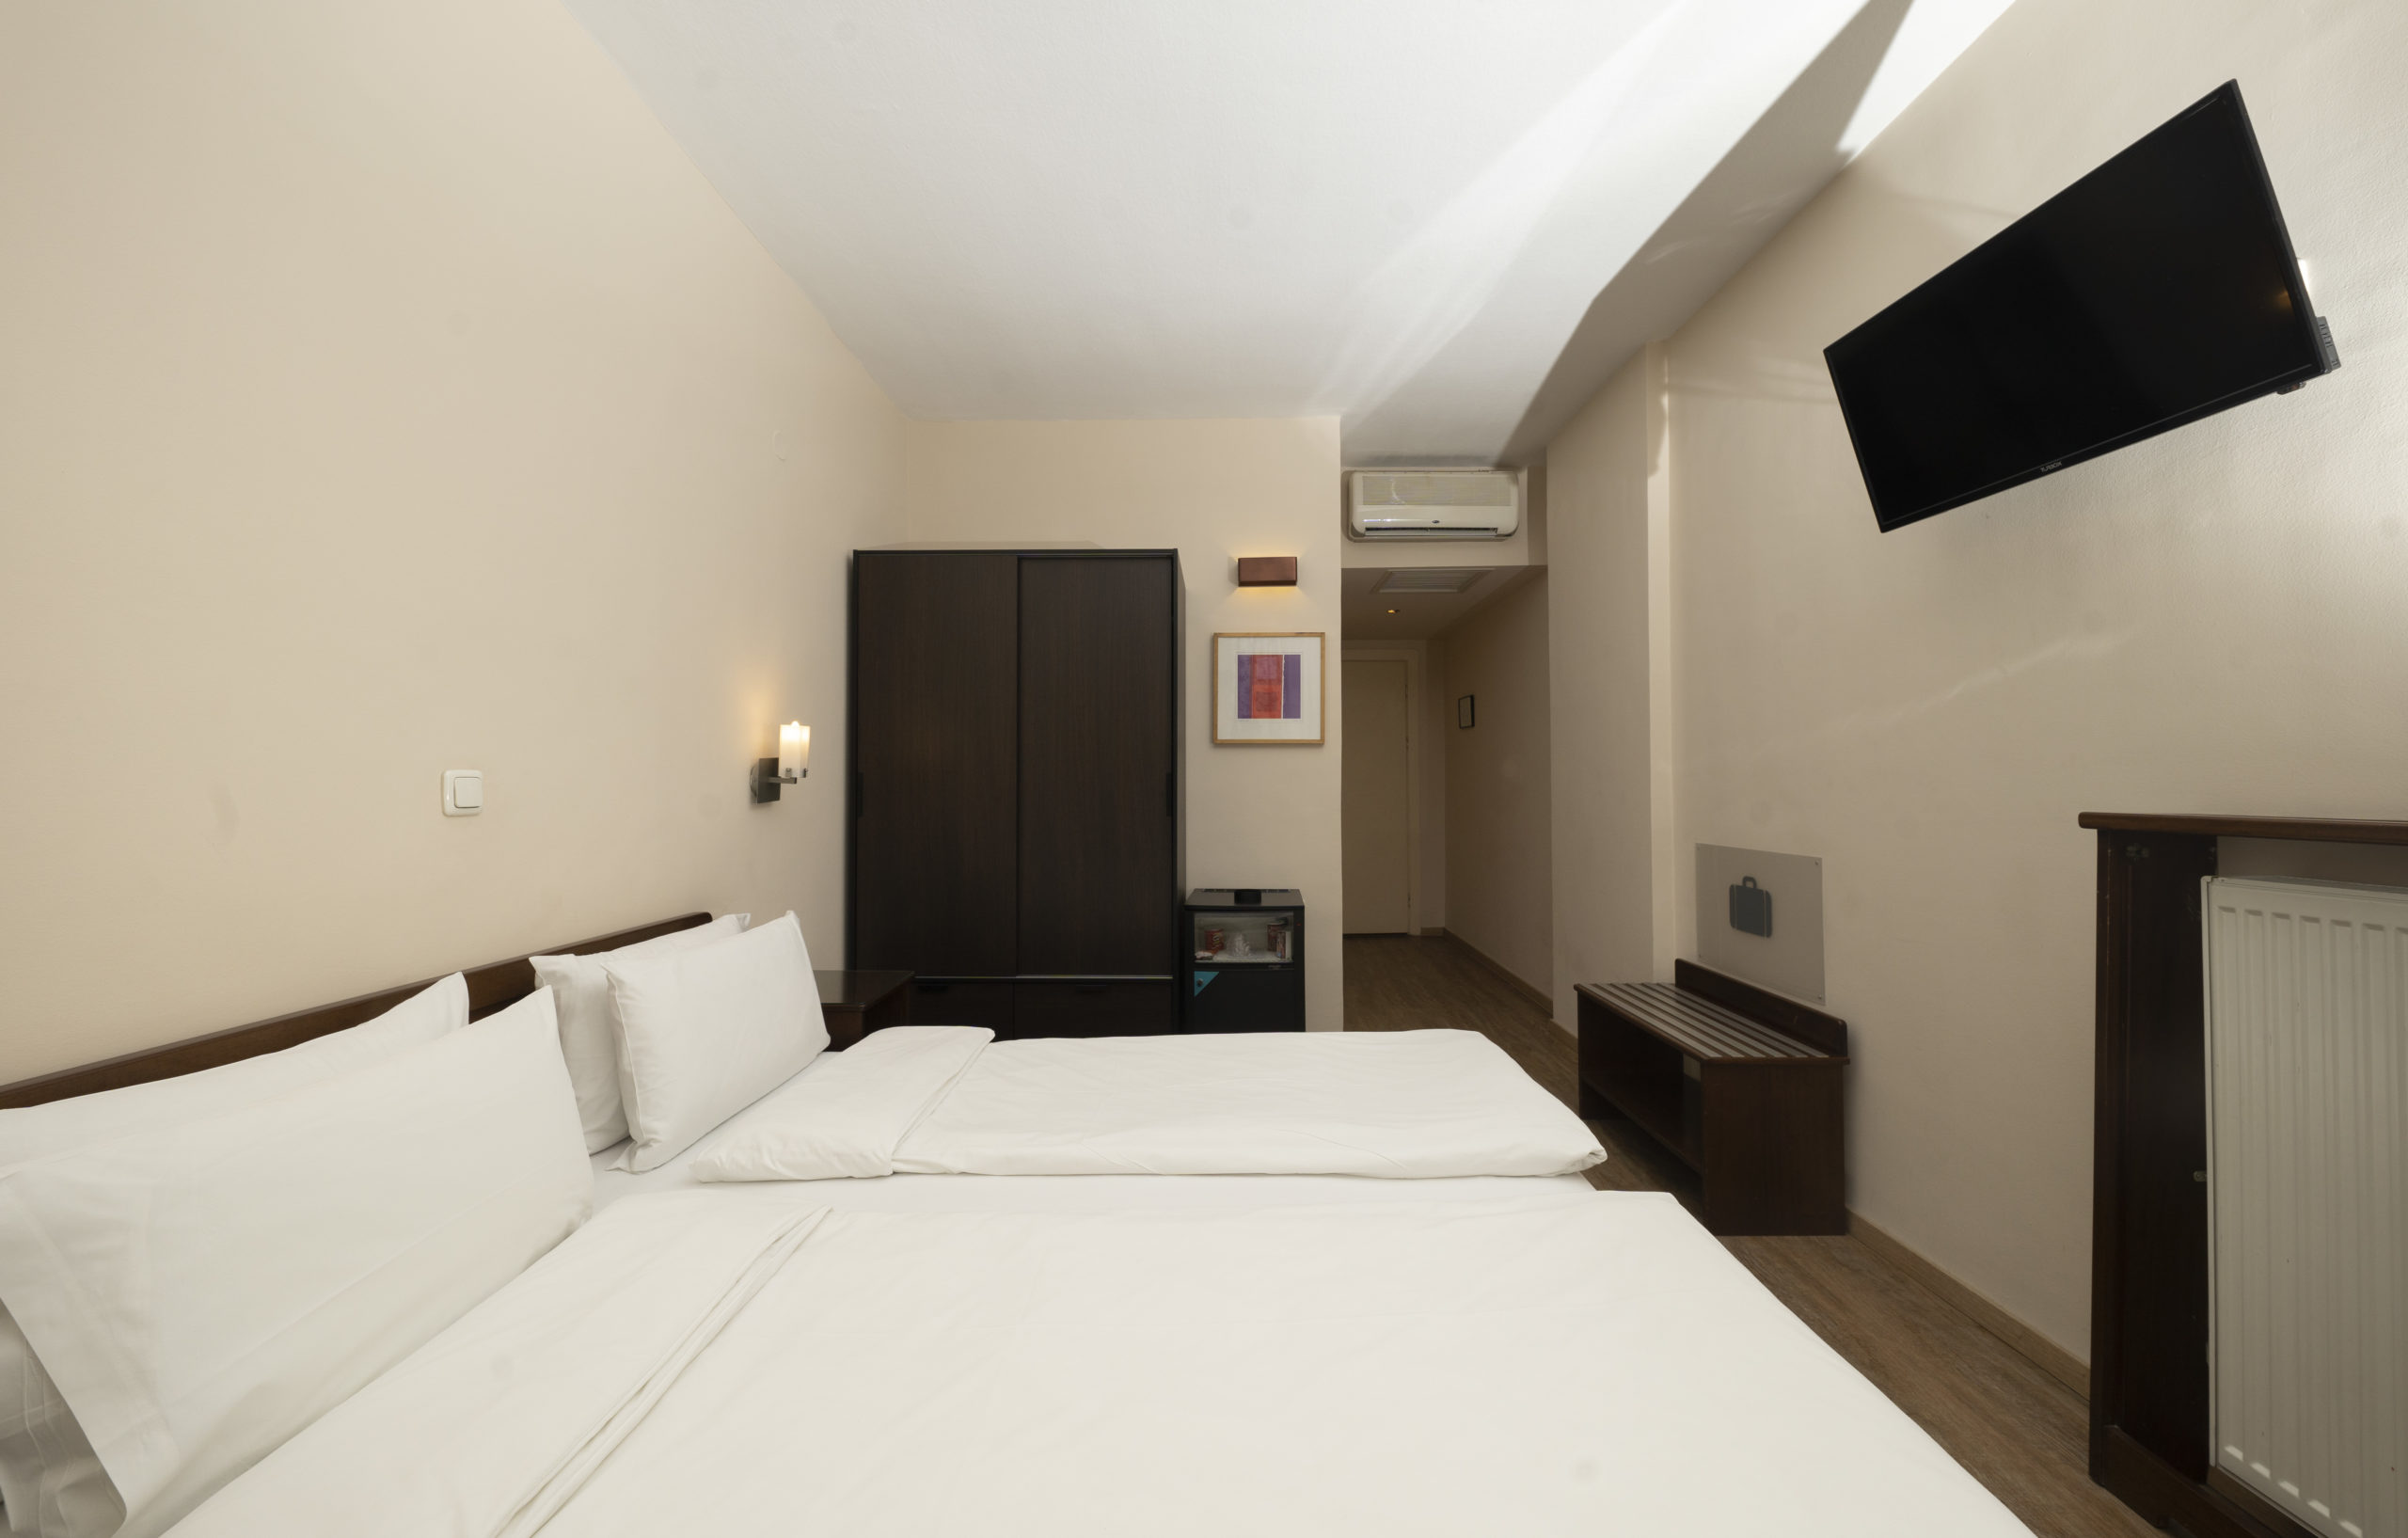 http://hotels%20thessaloniki%20greece%20|%20abc%20Hotel%20|%20Thessaloniki%20Greece